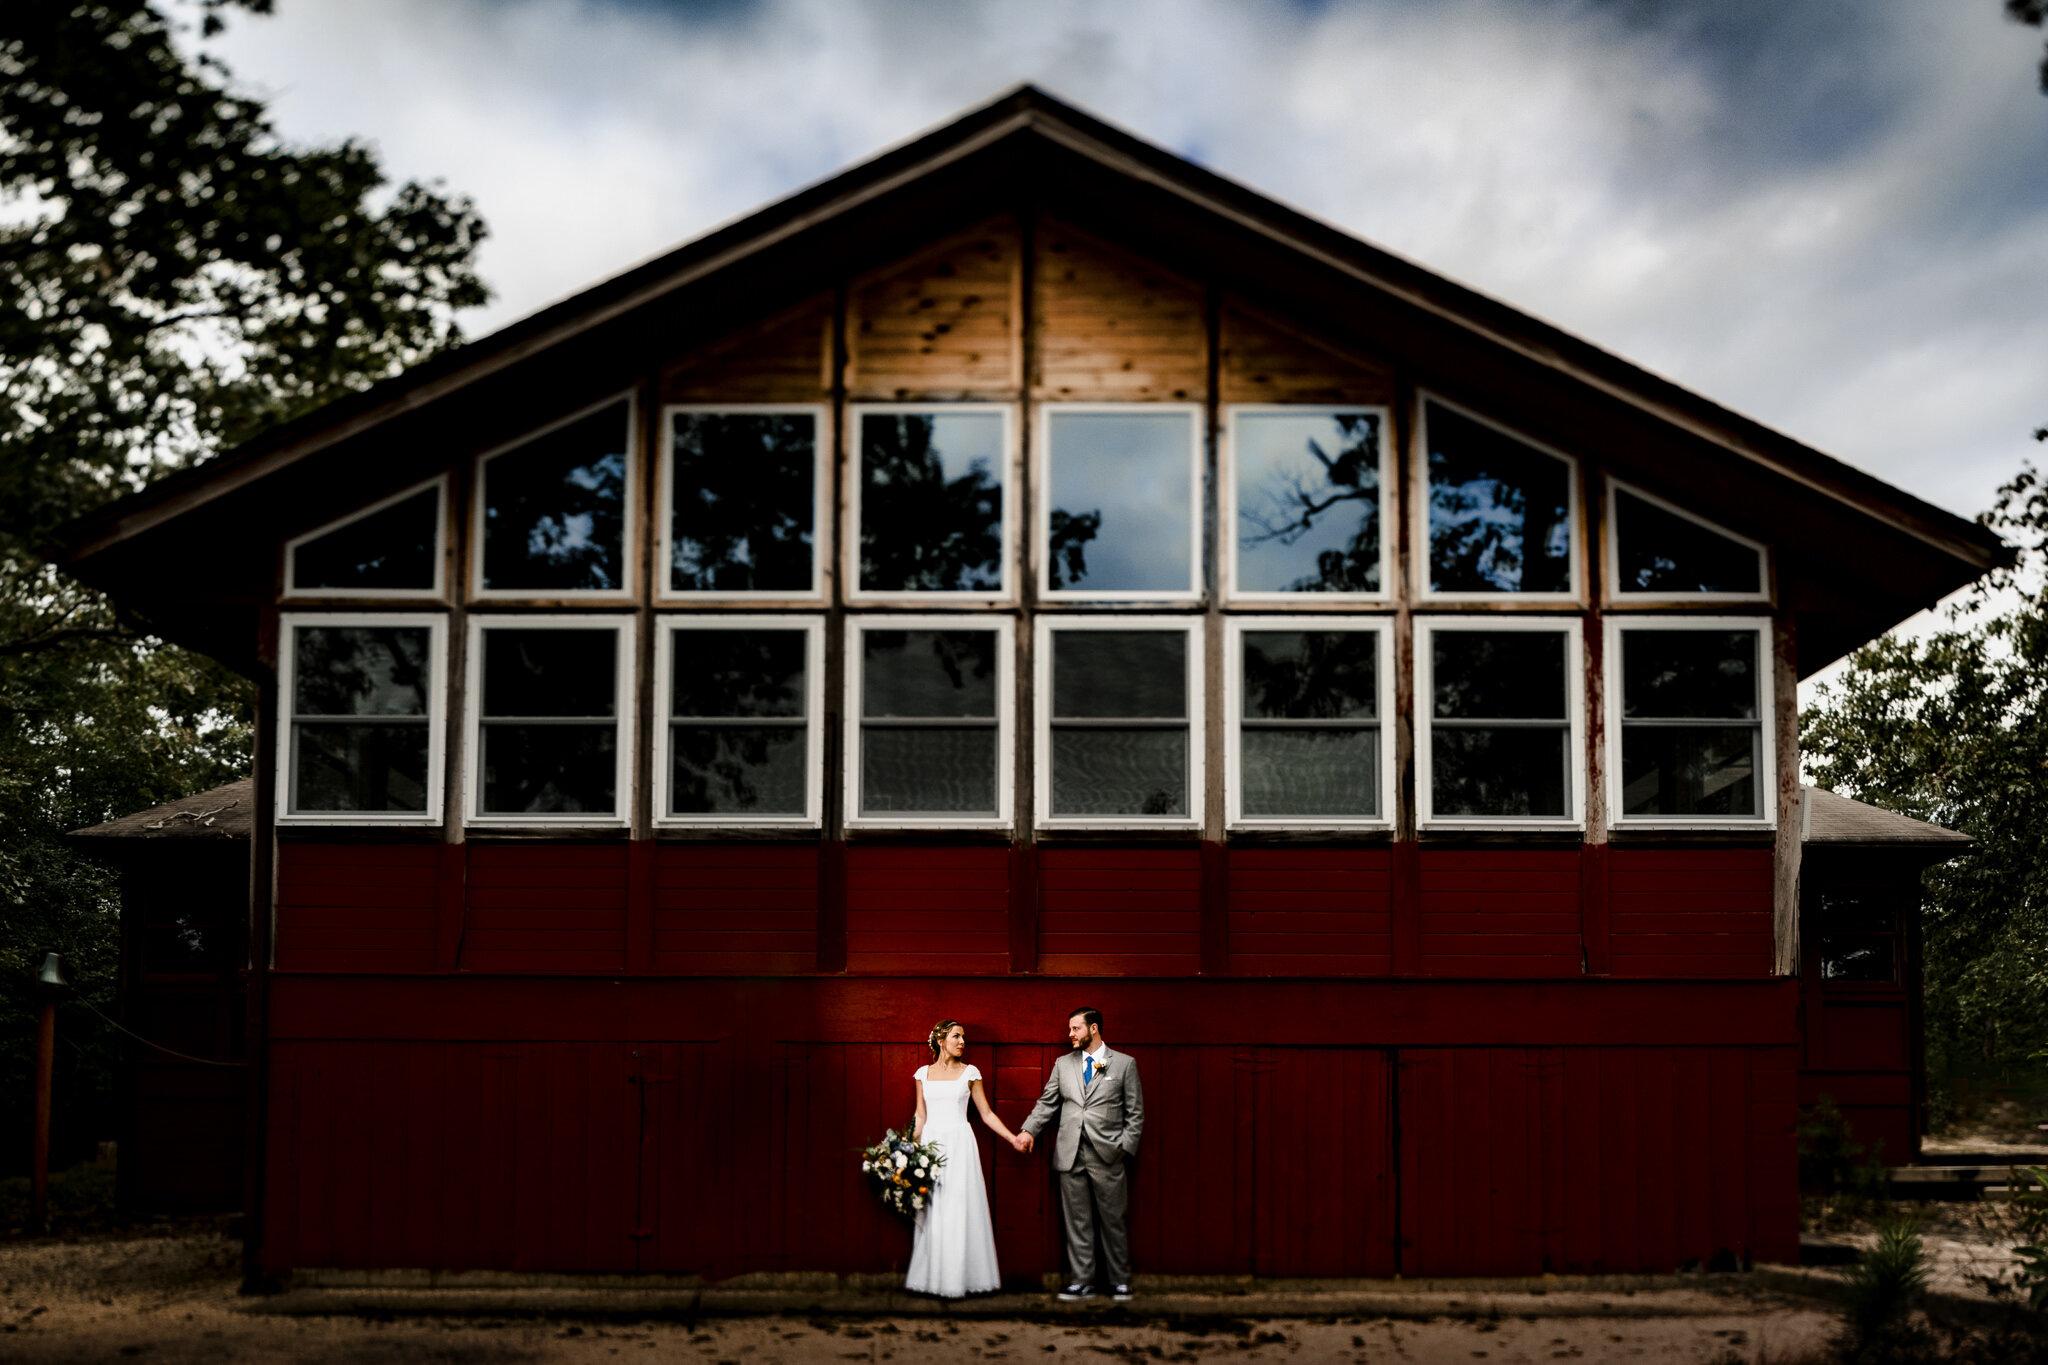 Niemann-Camp-Inawendiwin-New-Jersey-Wedding-Photographer-19.JPG